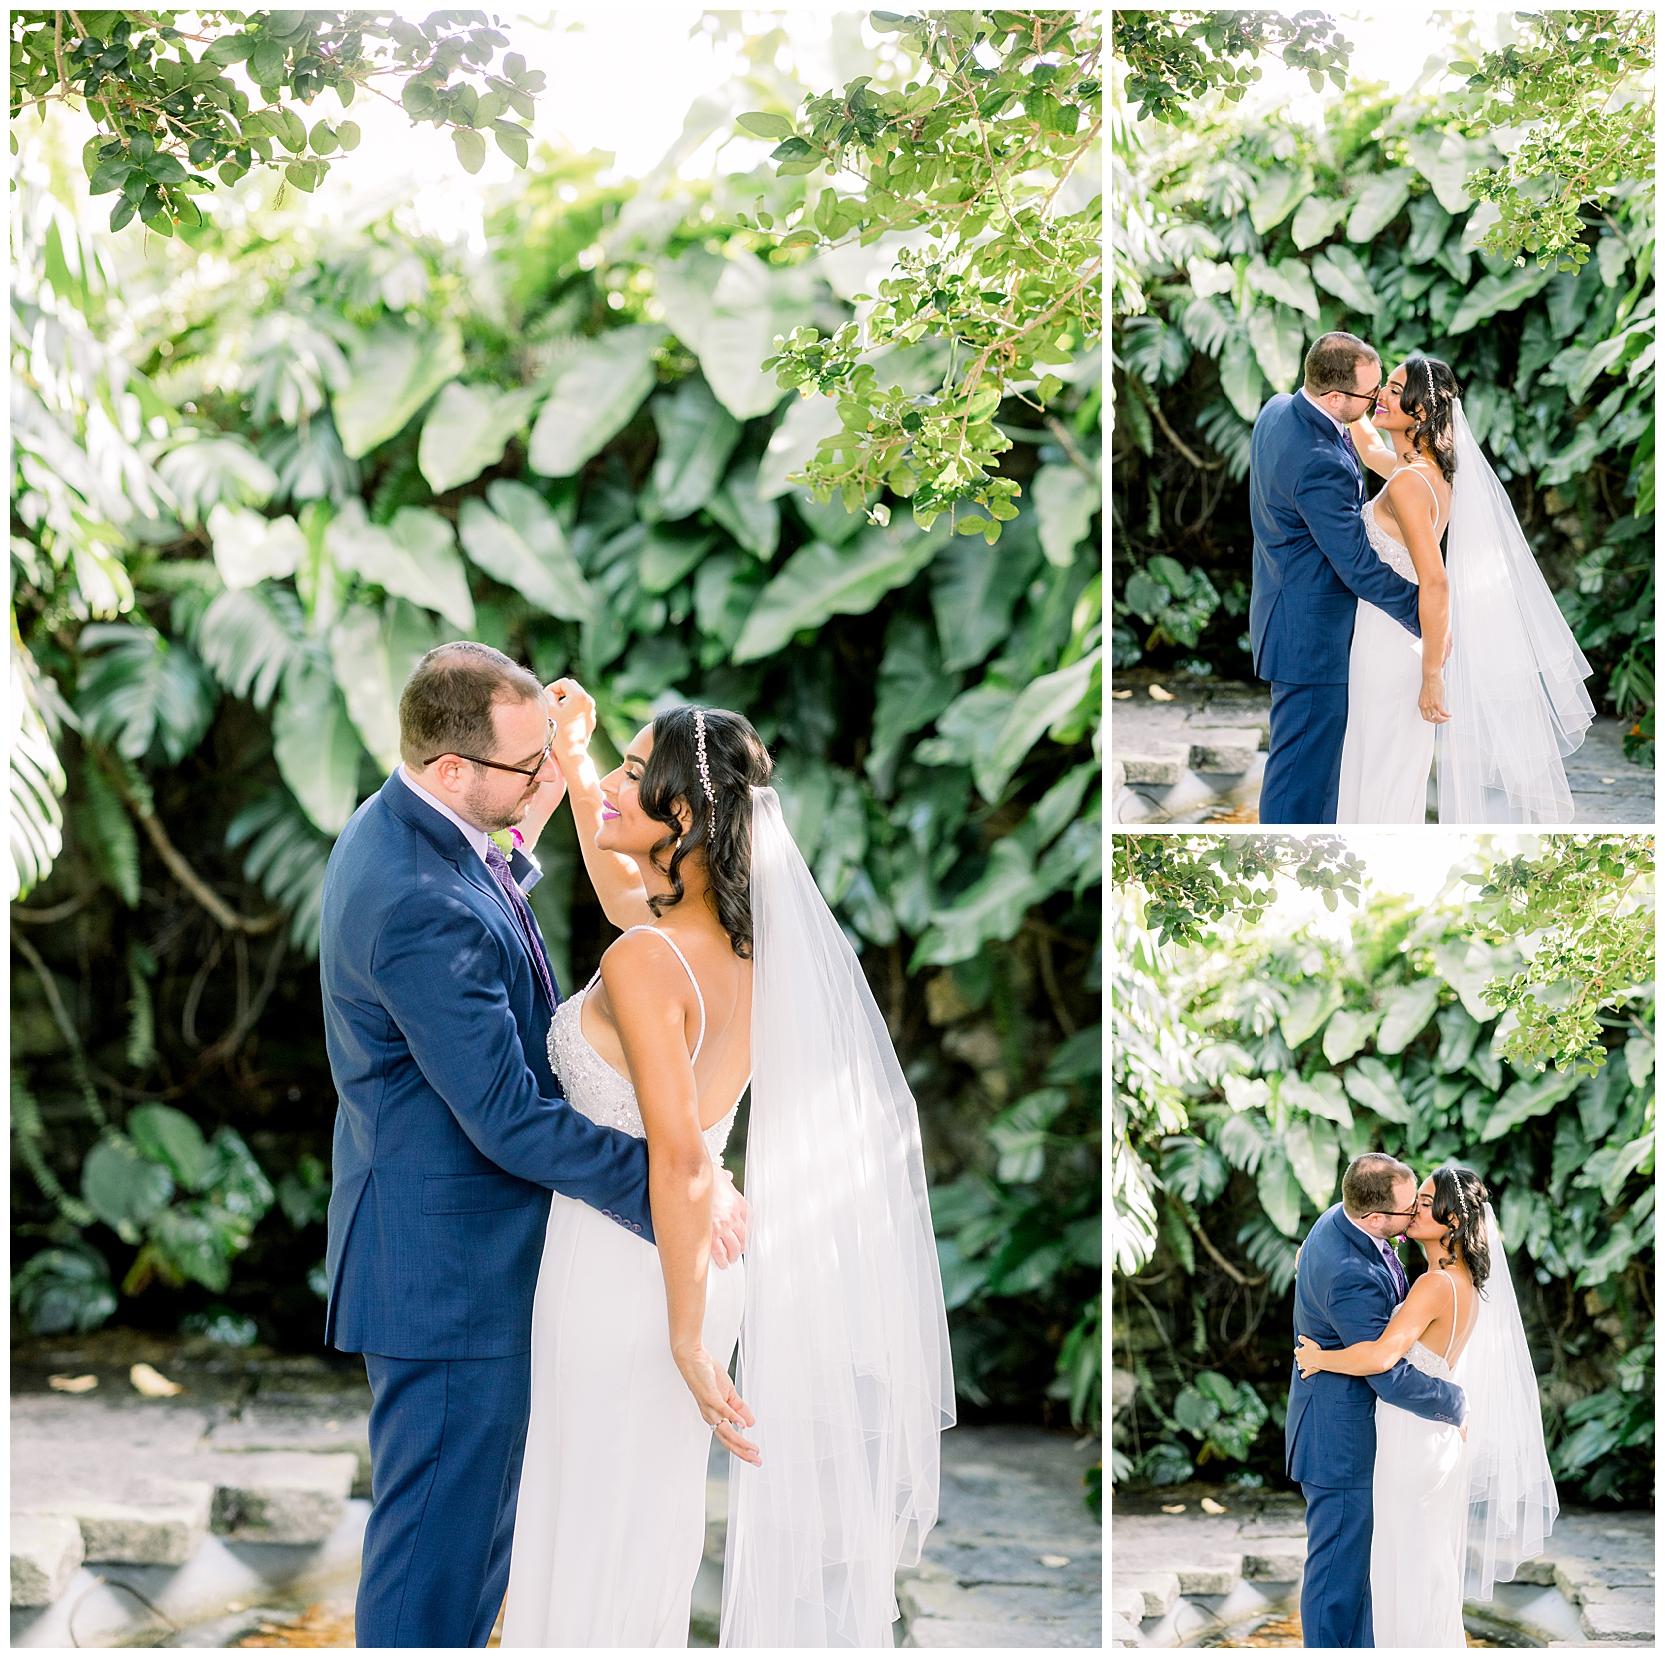 jessicafredericks_lakeland_tampa_wedding_purple_crazy hour_0024.jpg